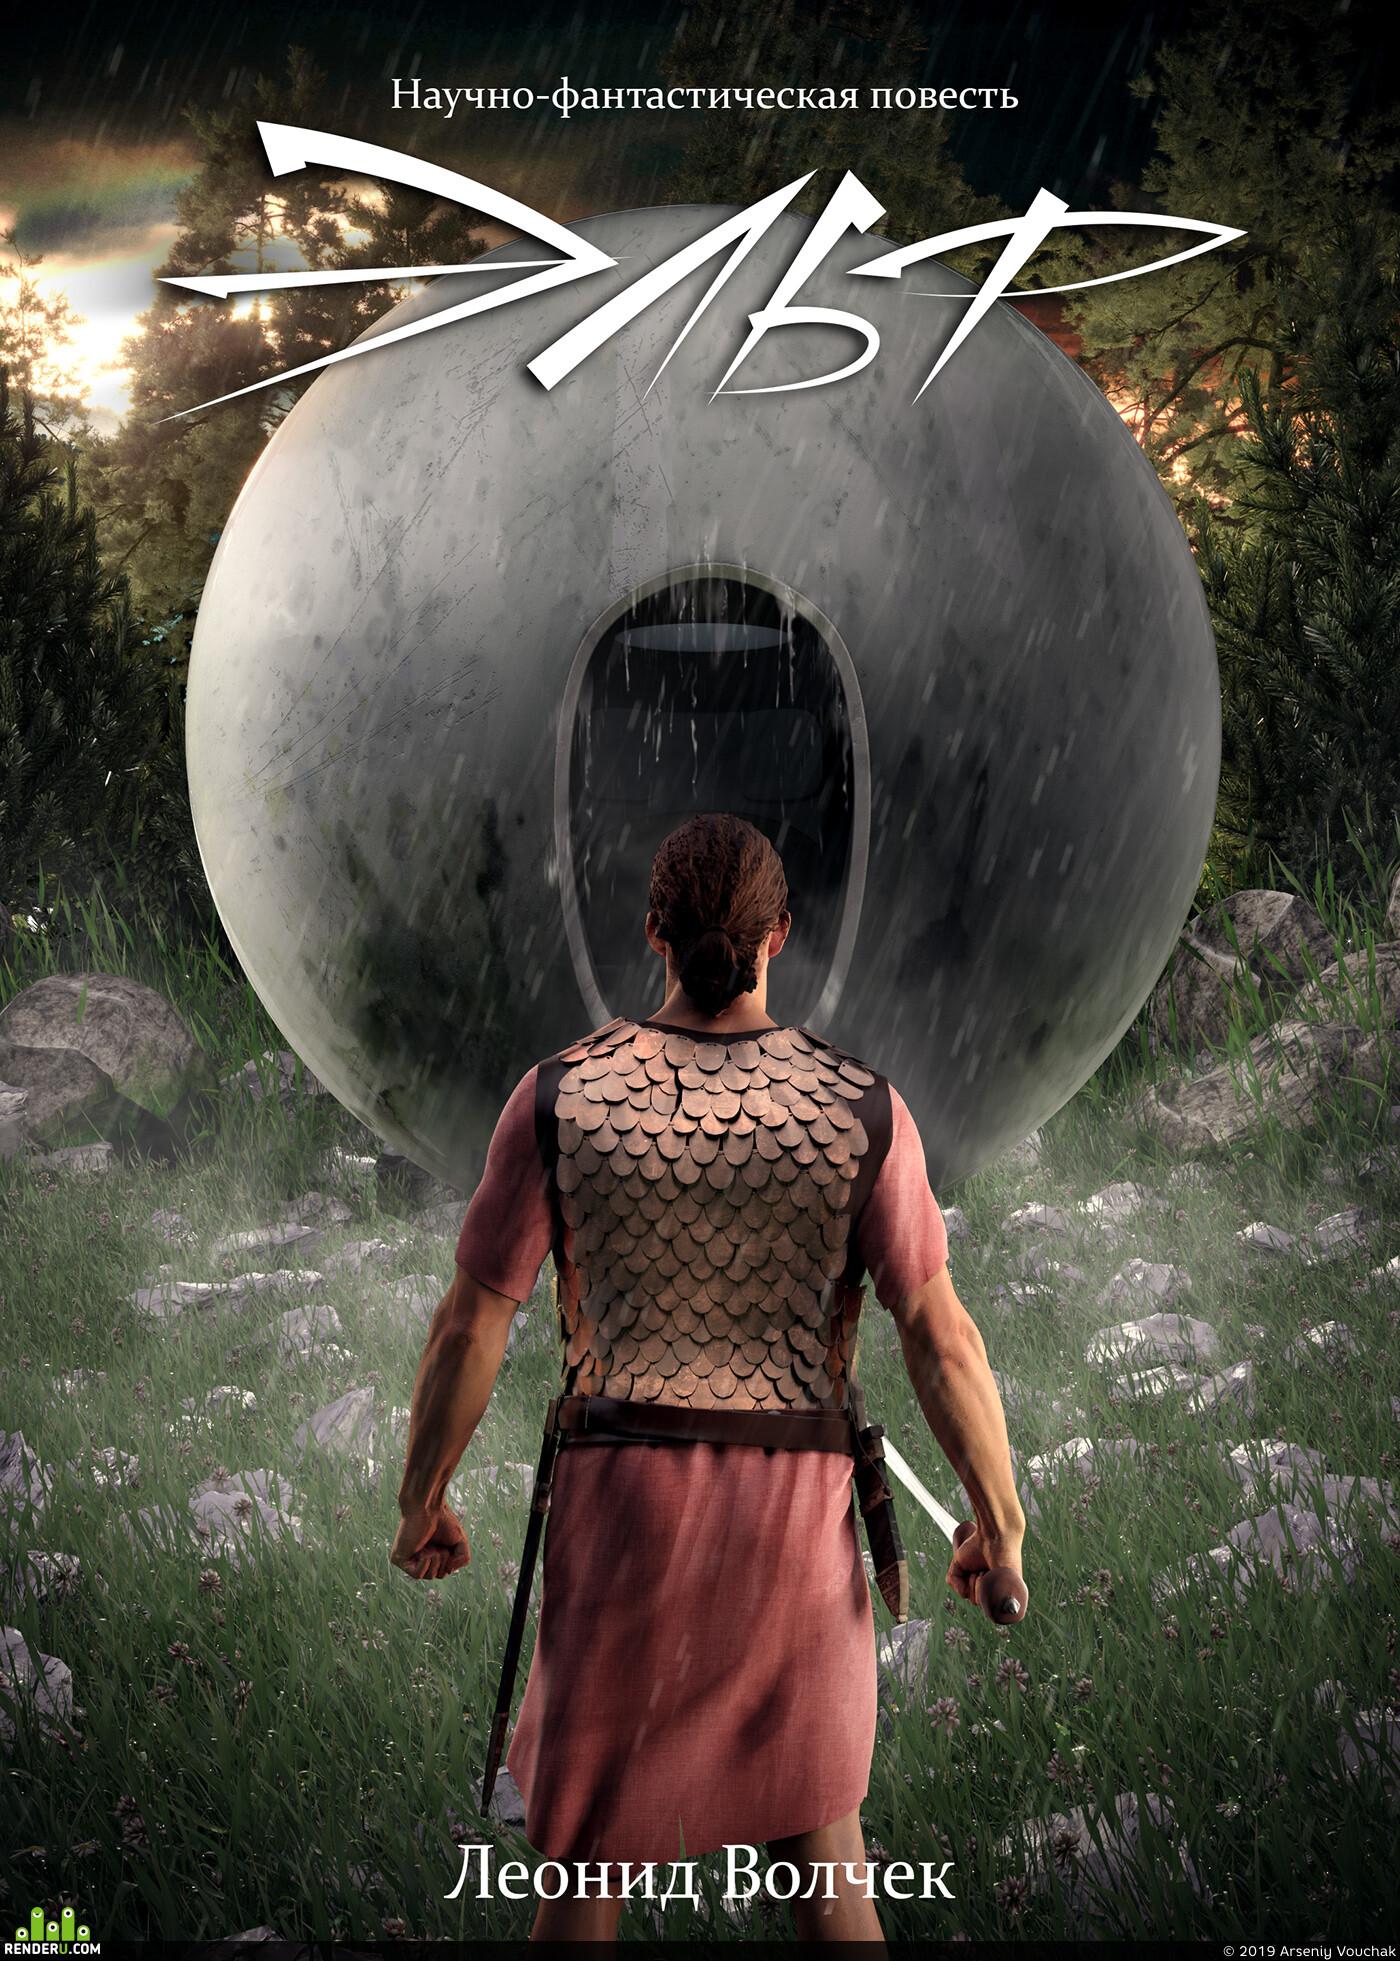 book, 3d, illustration, visualization, render, CG, sci-fi, fantastic, digital, art